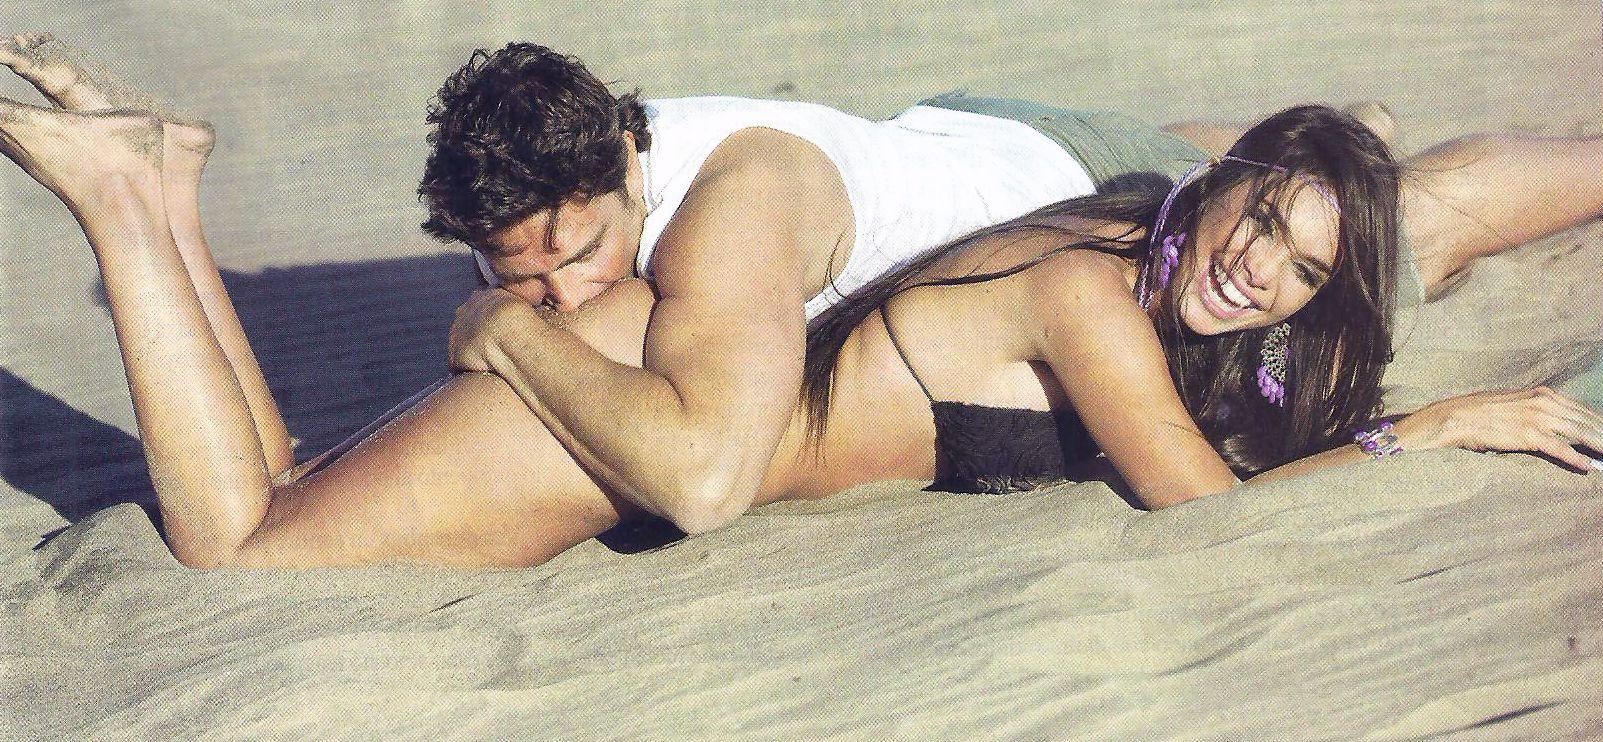 Matías Alé le come la cola a Sabrina Ravelli